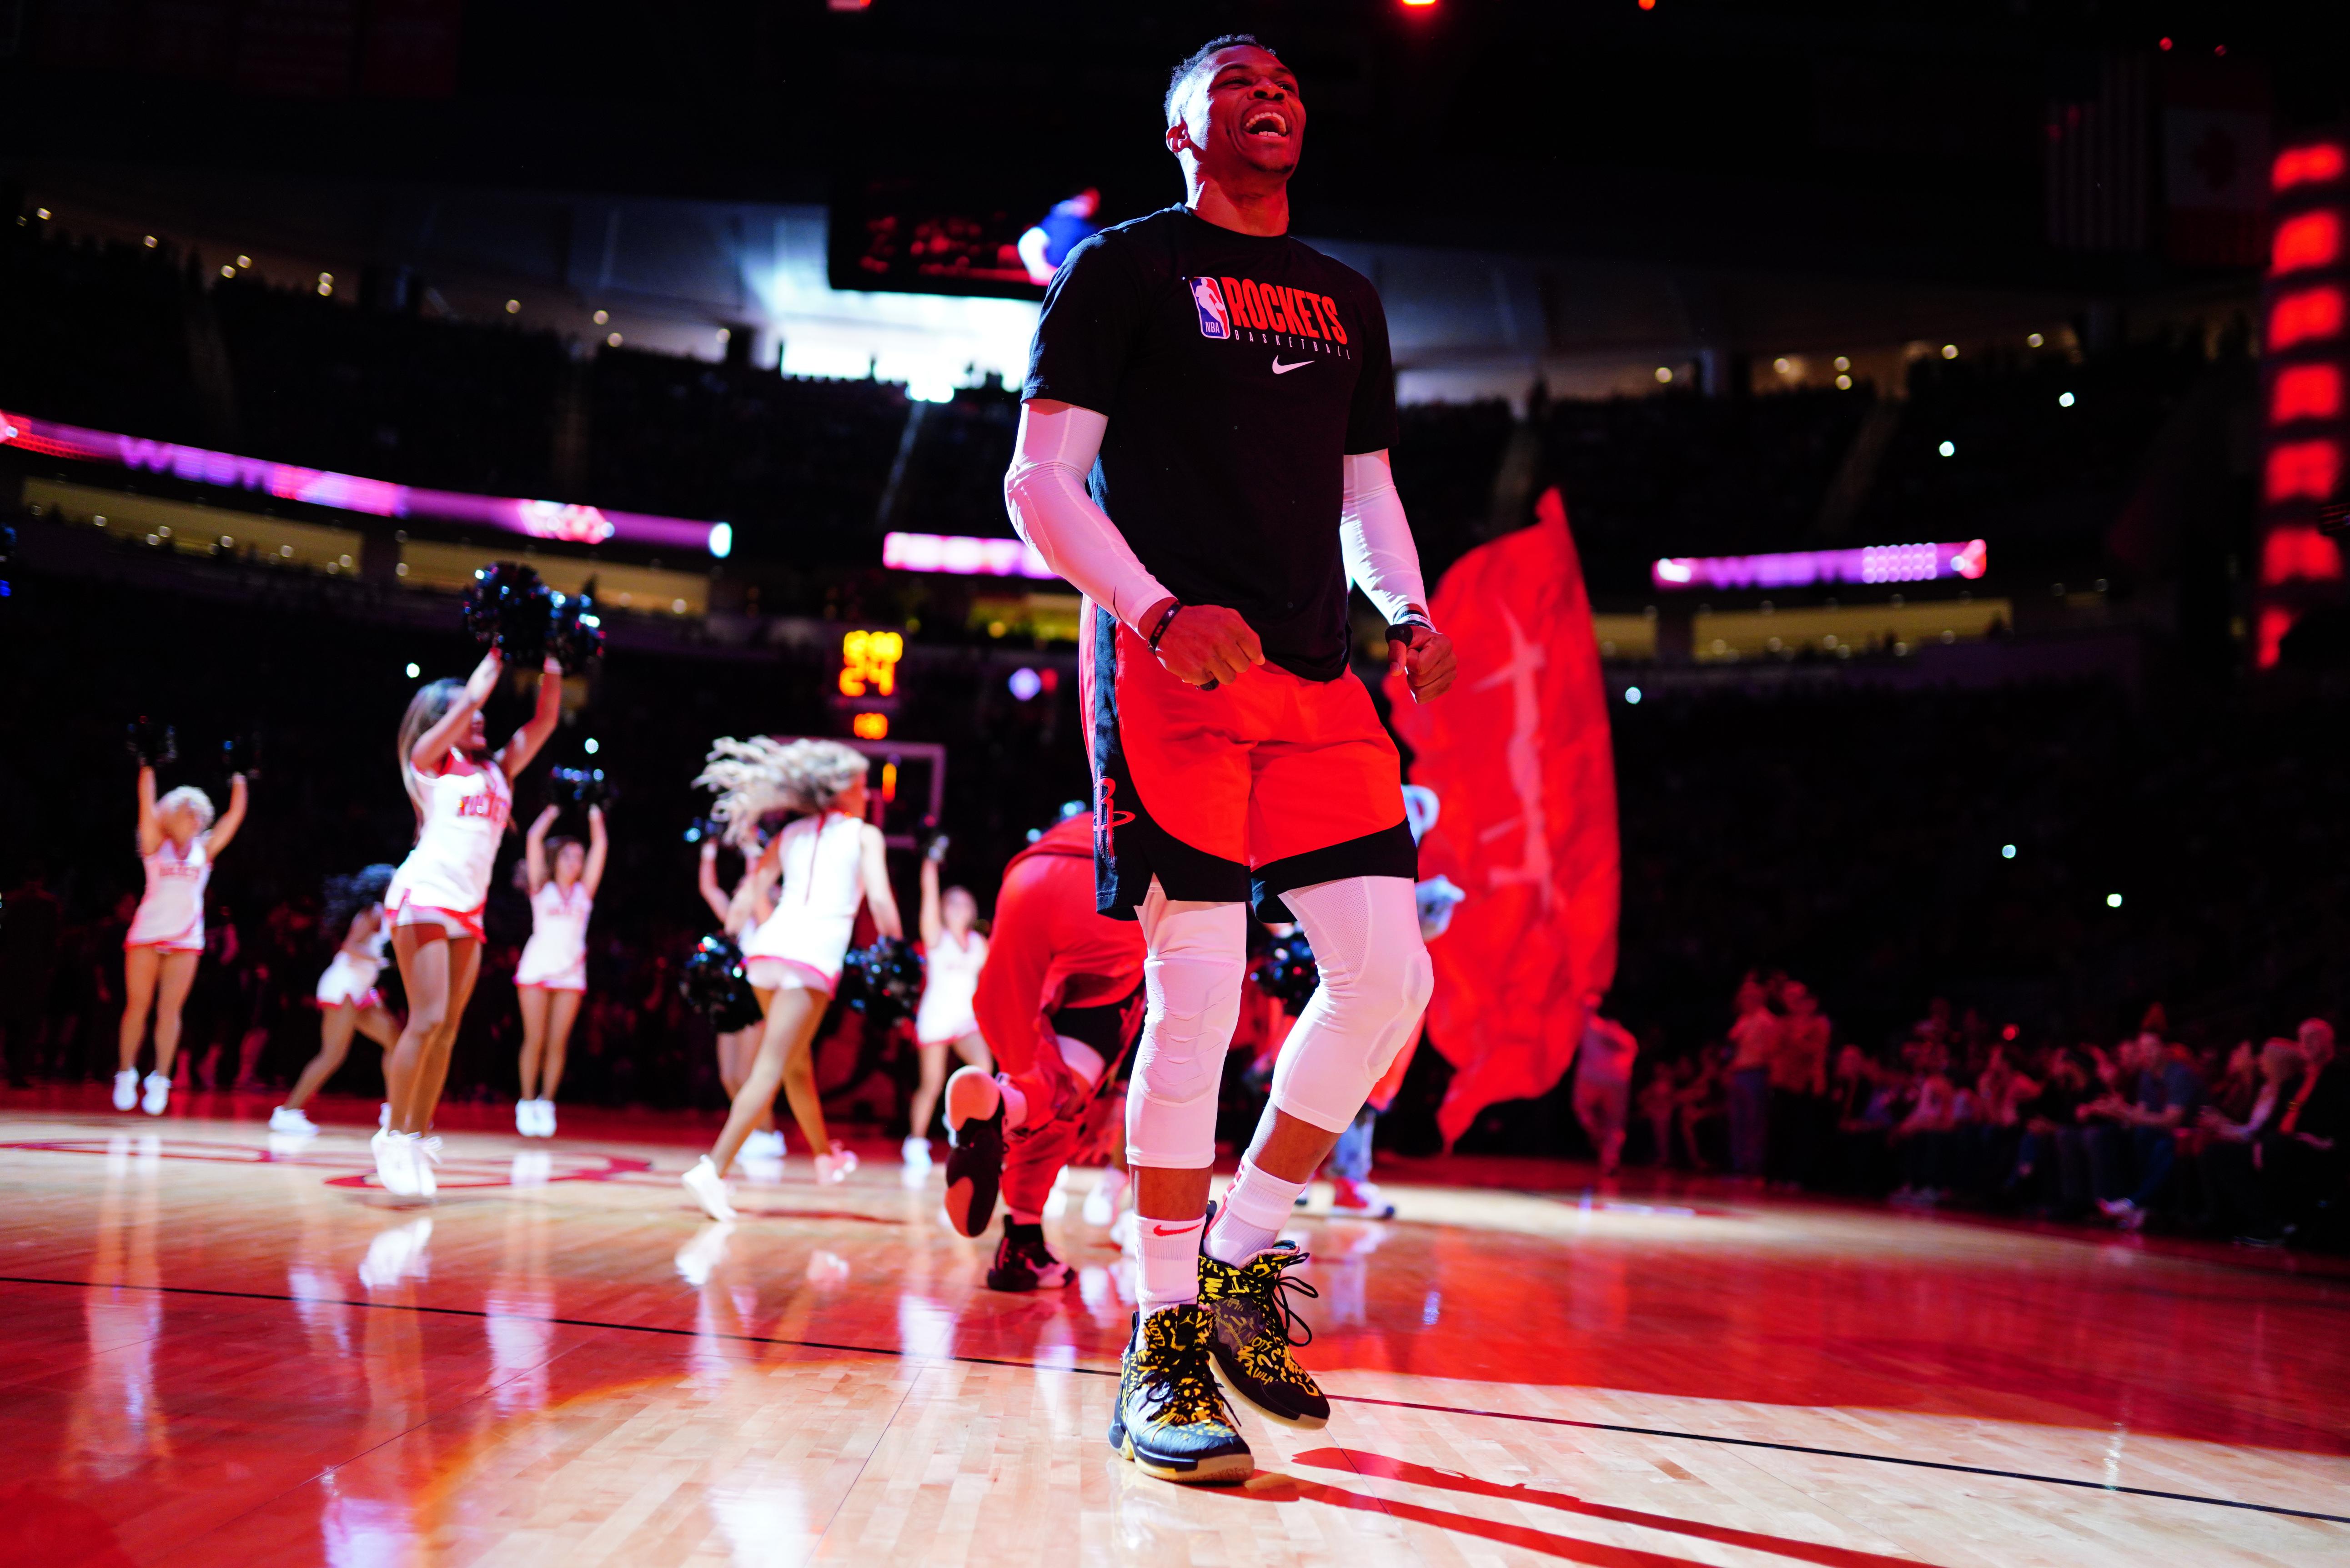 Dallas Mavericks vs Houston Rockets